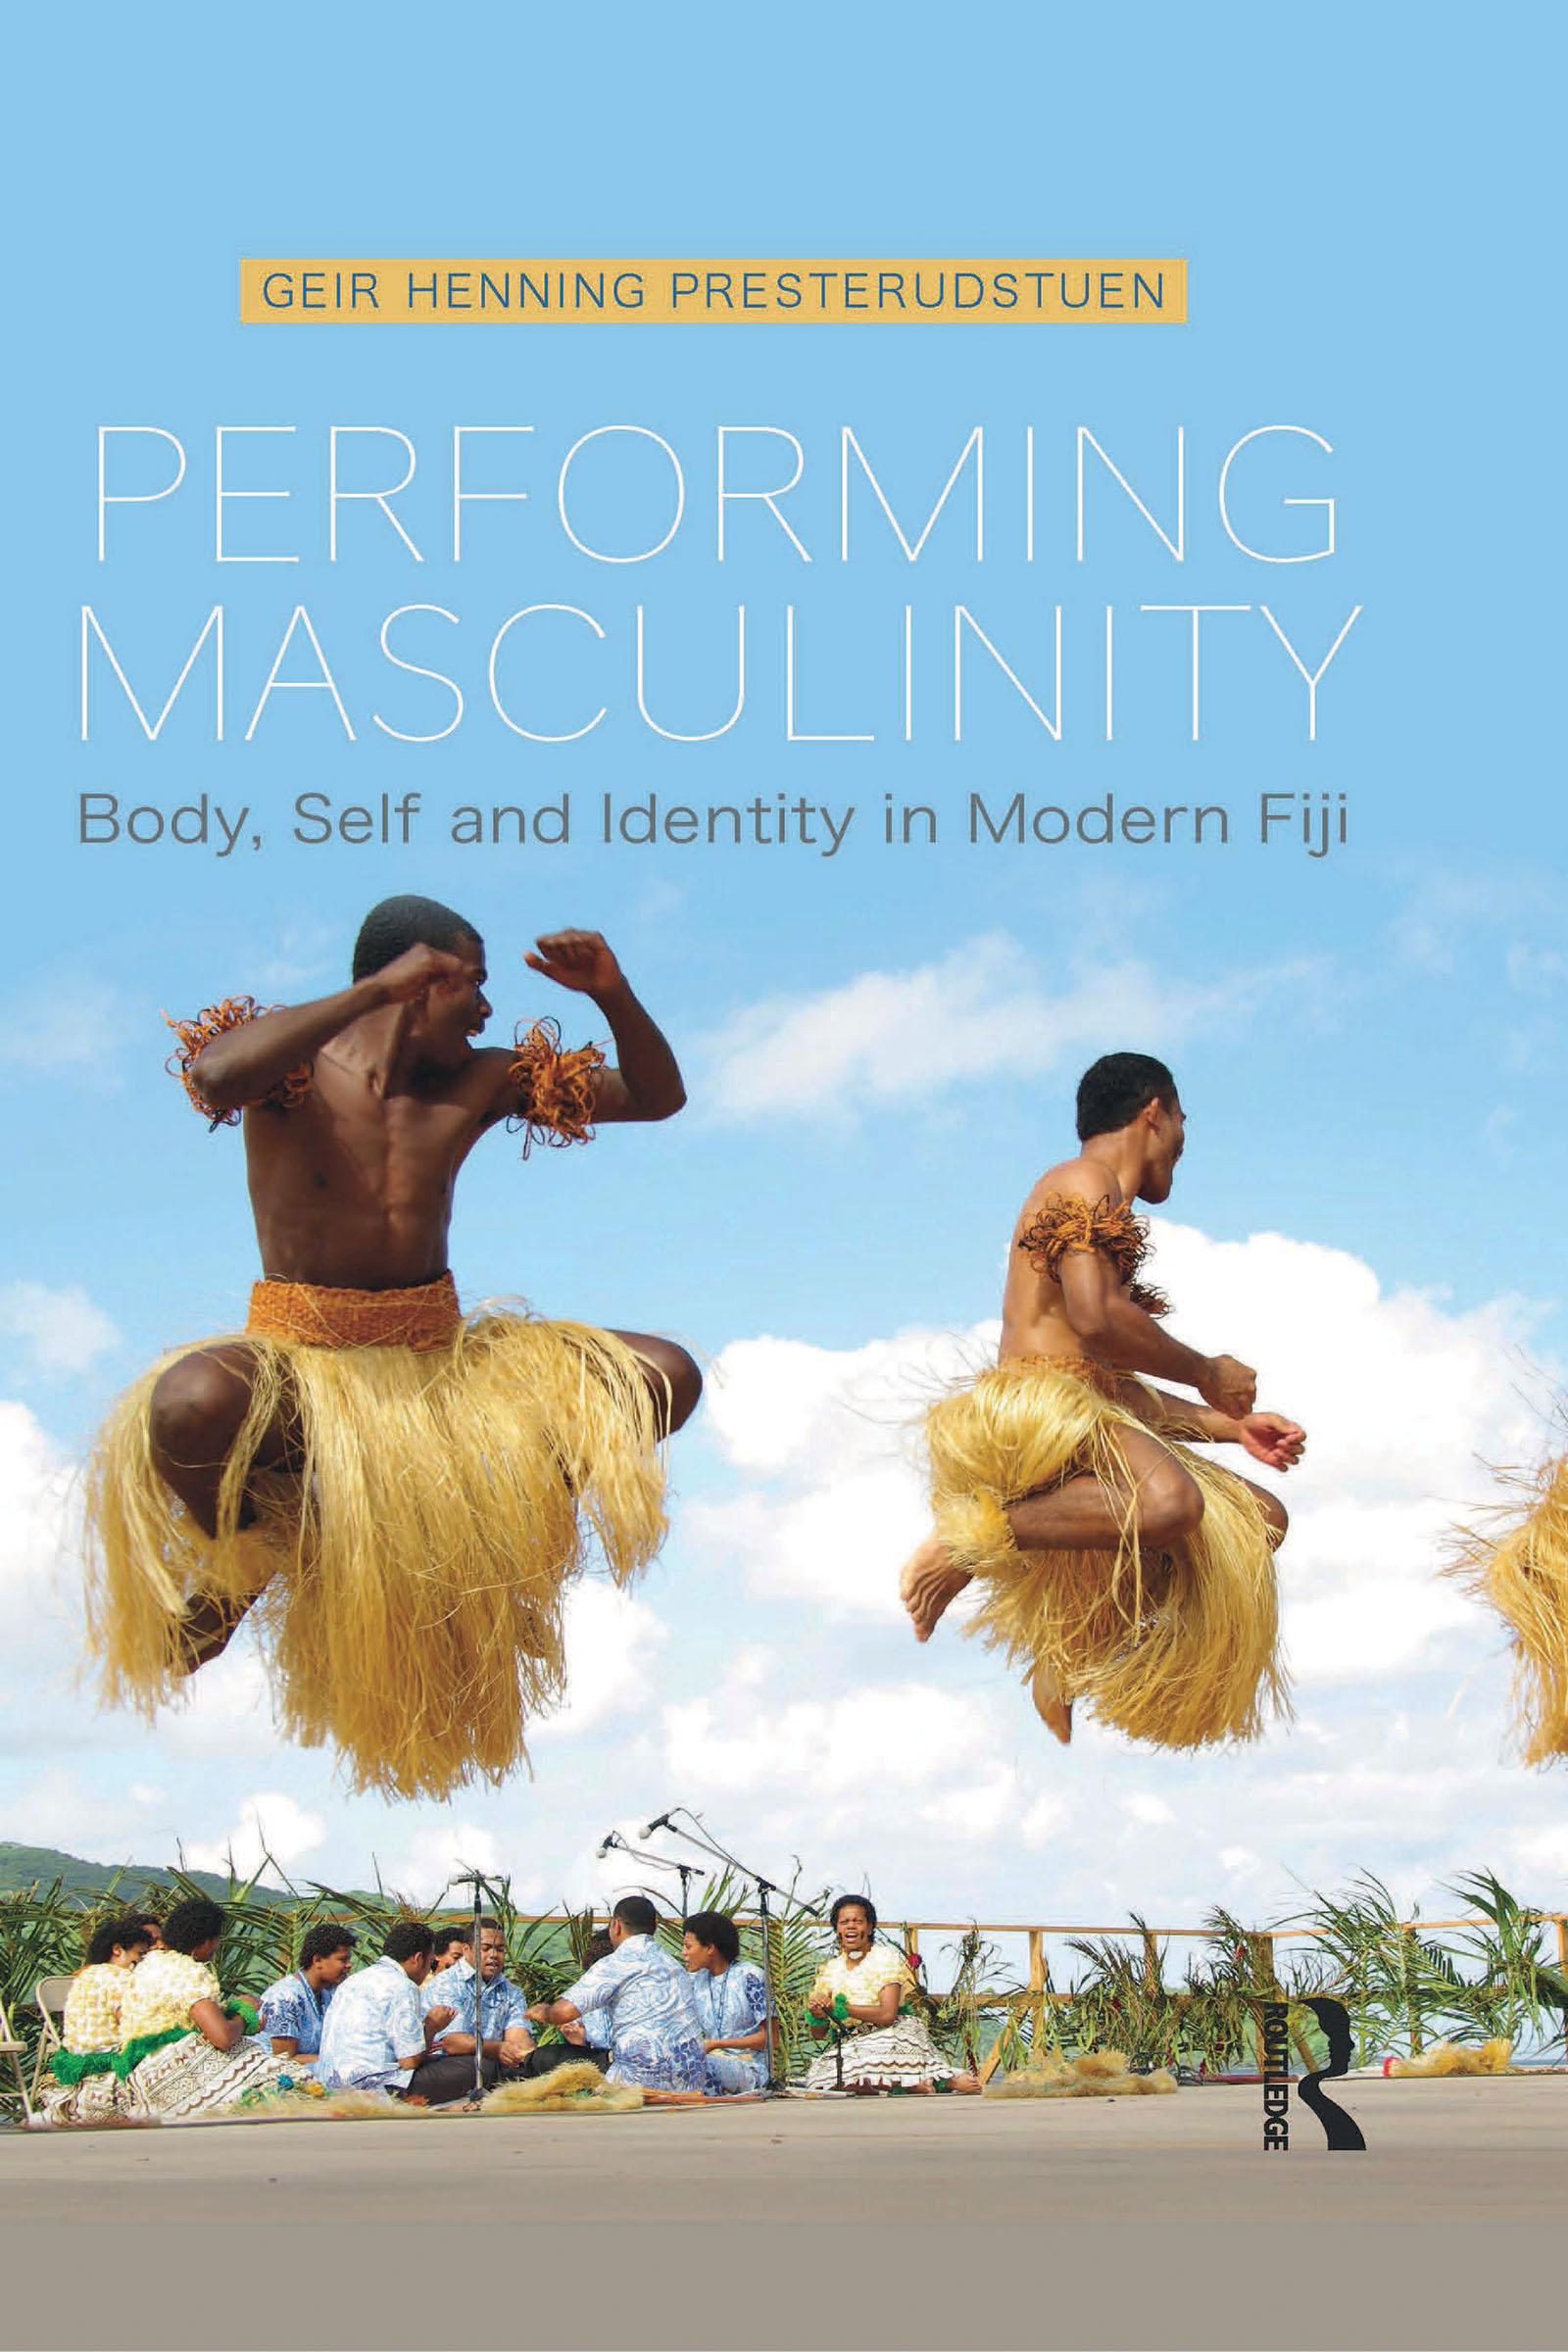 Postscript: Modern masculinities in Fiji and theoretical implications